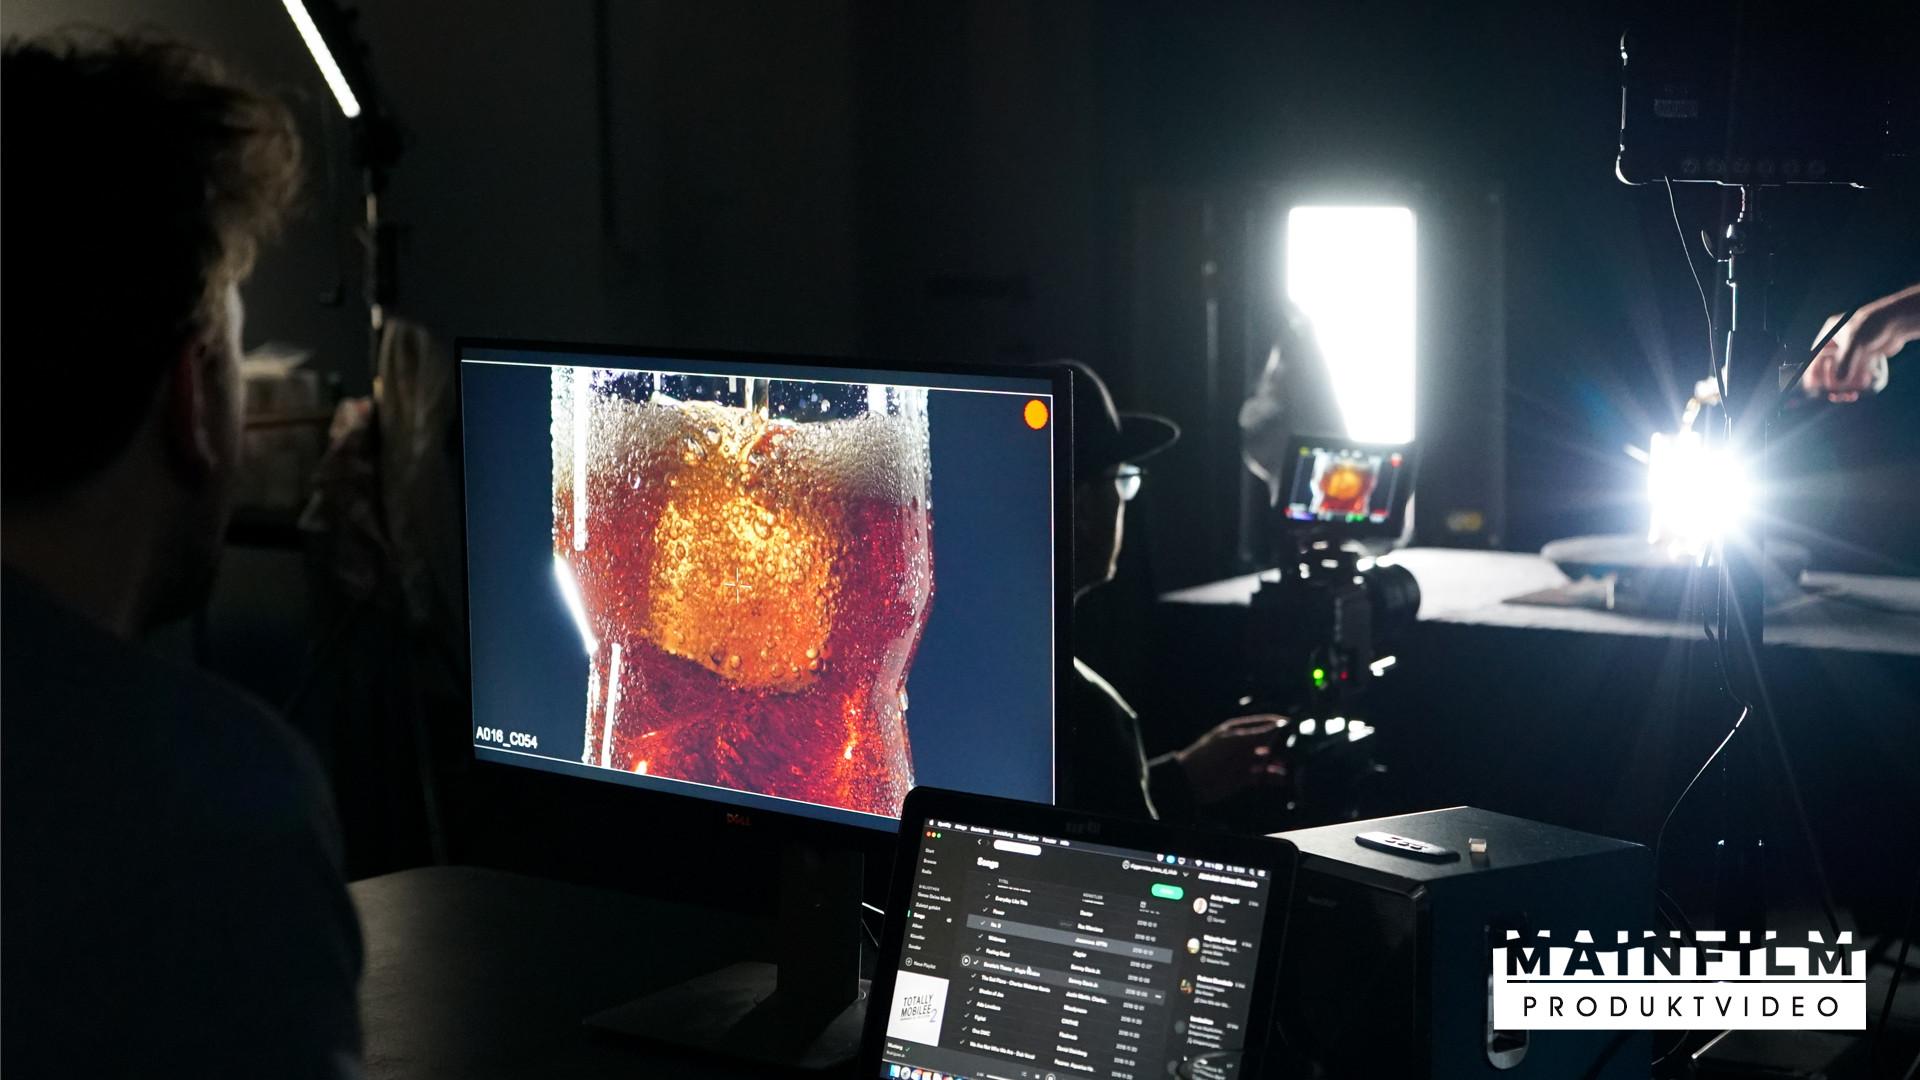 agitano, mainfilm, videos, videoproduktion, filmproduktion, mainfilm filmproduktion frankfurt